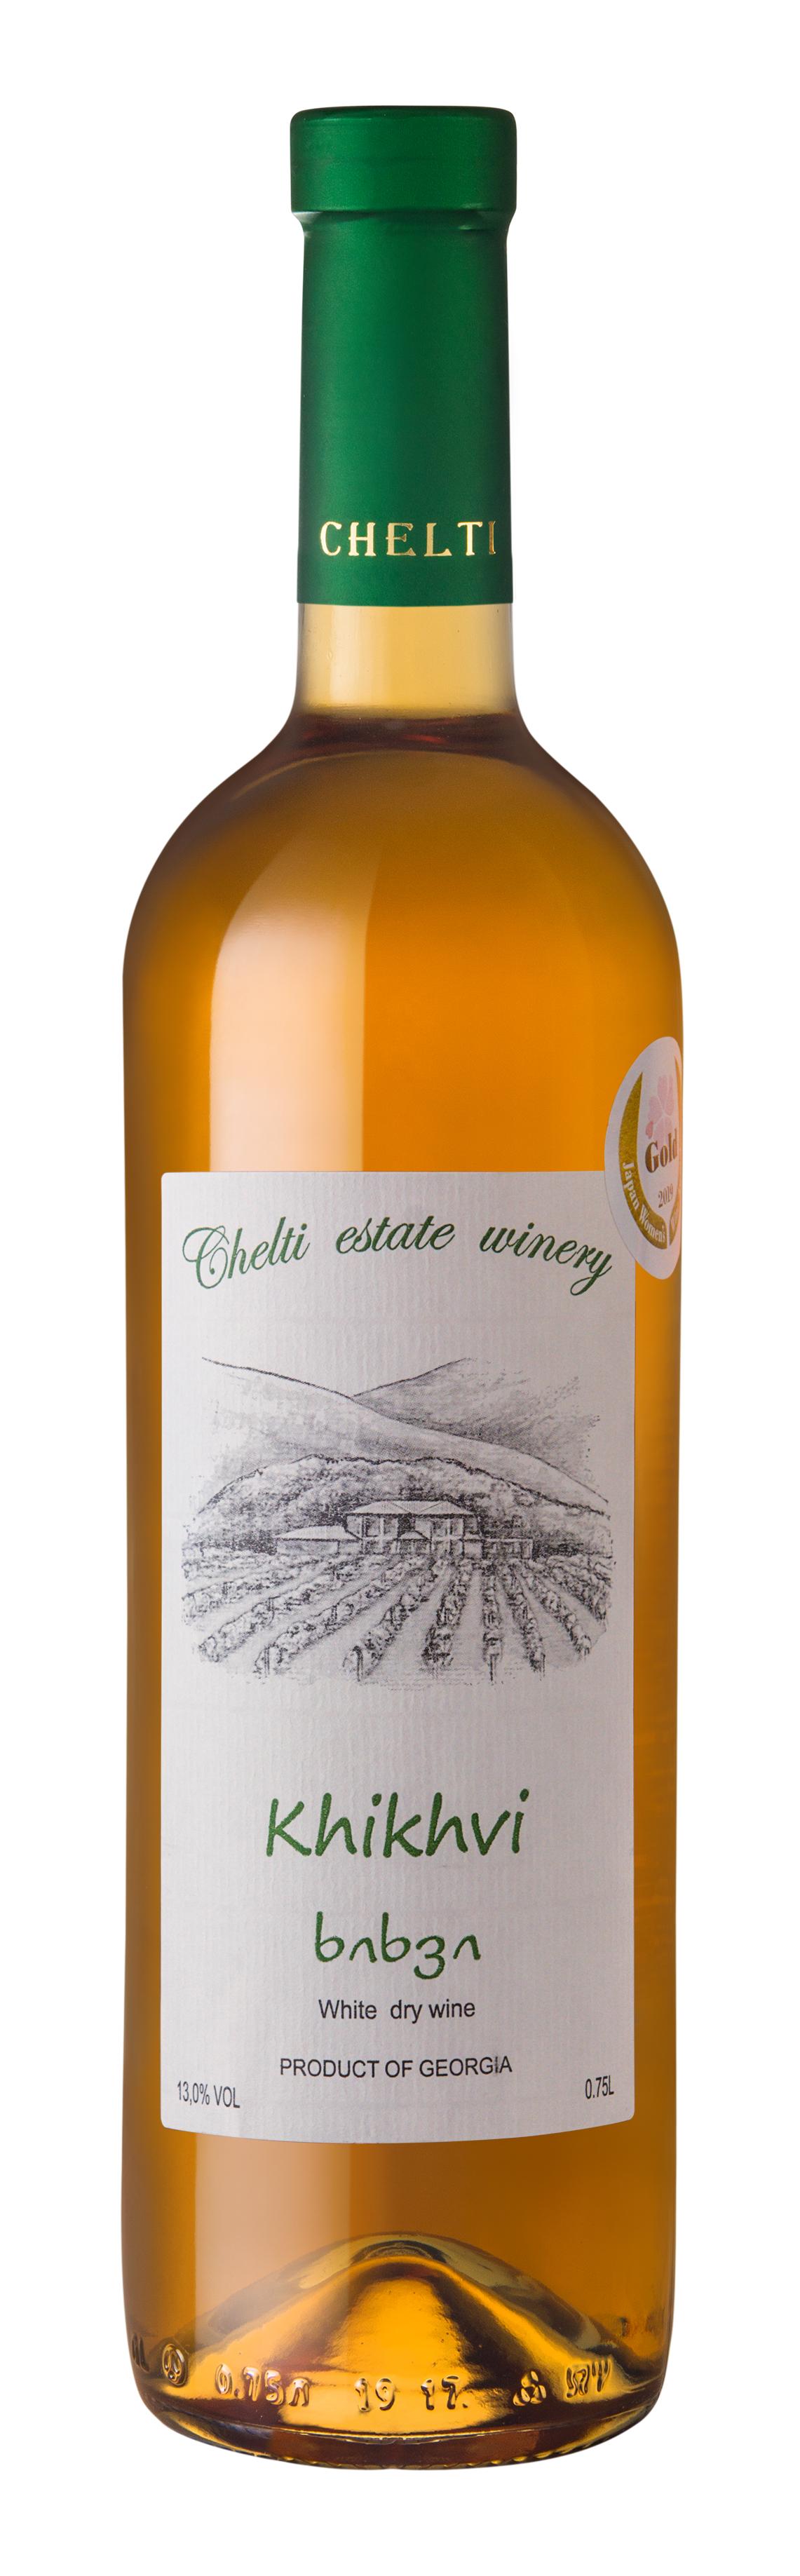 Chelti of Qvevri Amber Wine - Rkatsiteli 50%, Mtsvane 50% – White dry , Alcohol: 13% – Volume: 0.75 LDry white wine made from the Rkatsiteli and Mtsvane grape varieties, cultivated in the region of Kakheti, in the Manavi micro-zone. The wine is produced in Qvevri, the traditional clay vessel used in Georgian wine production.